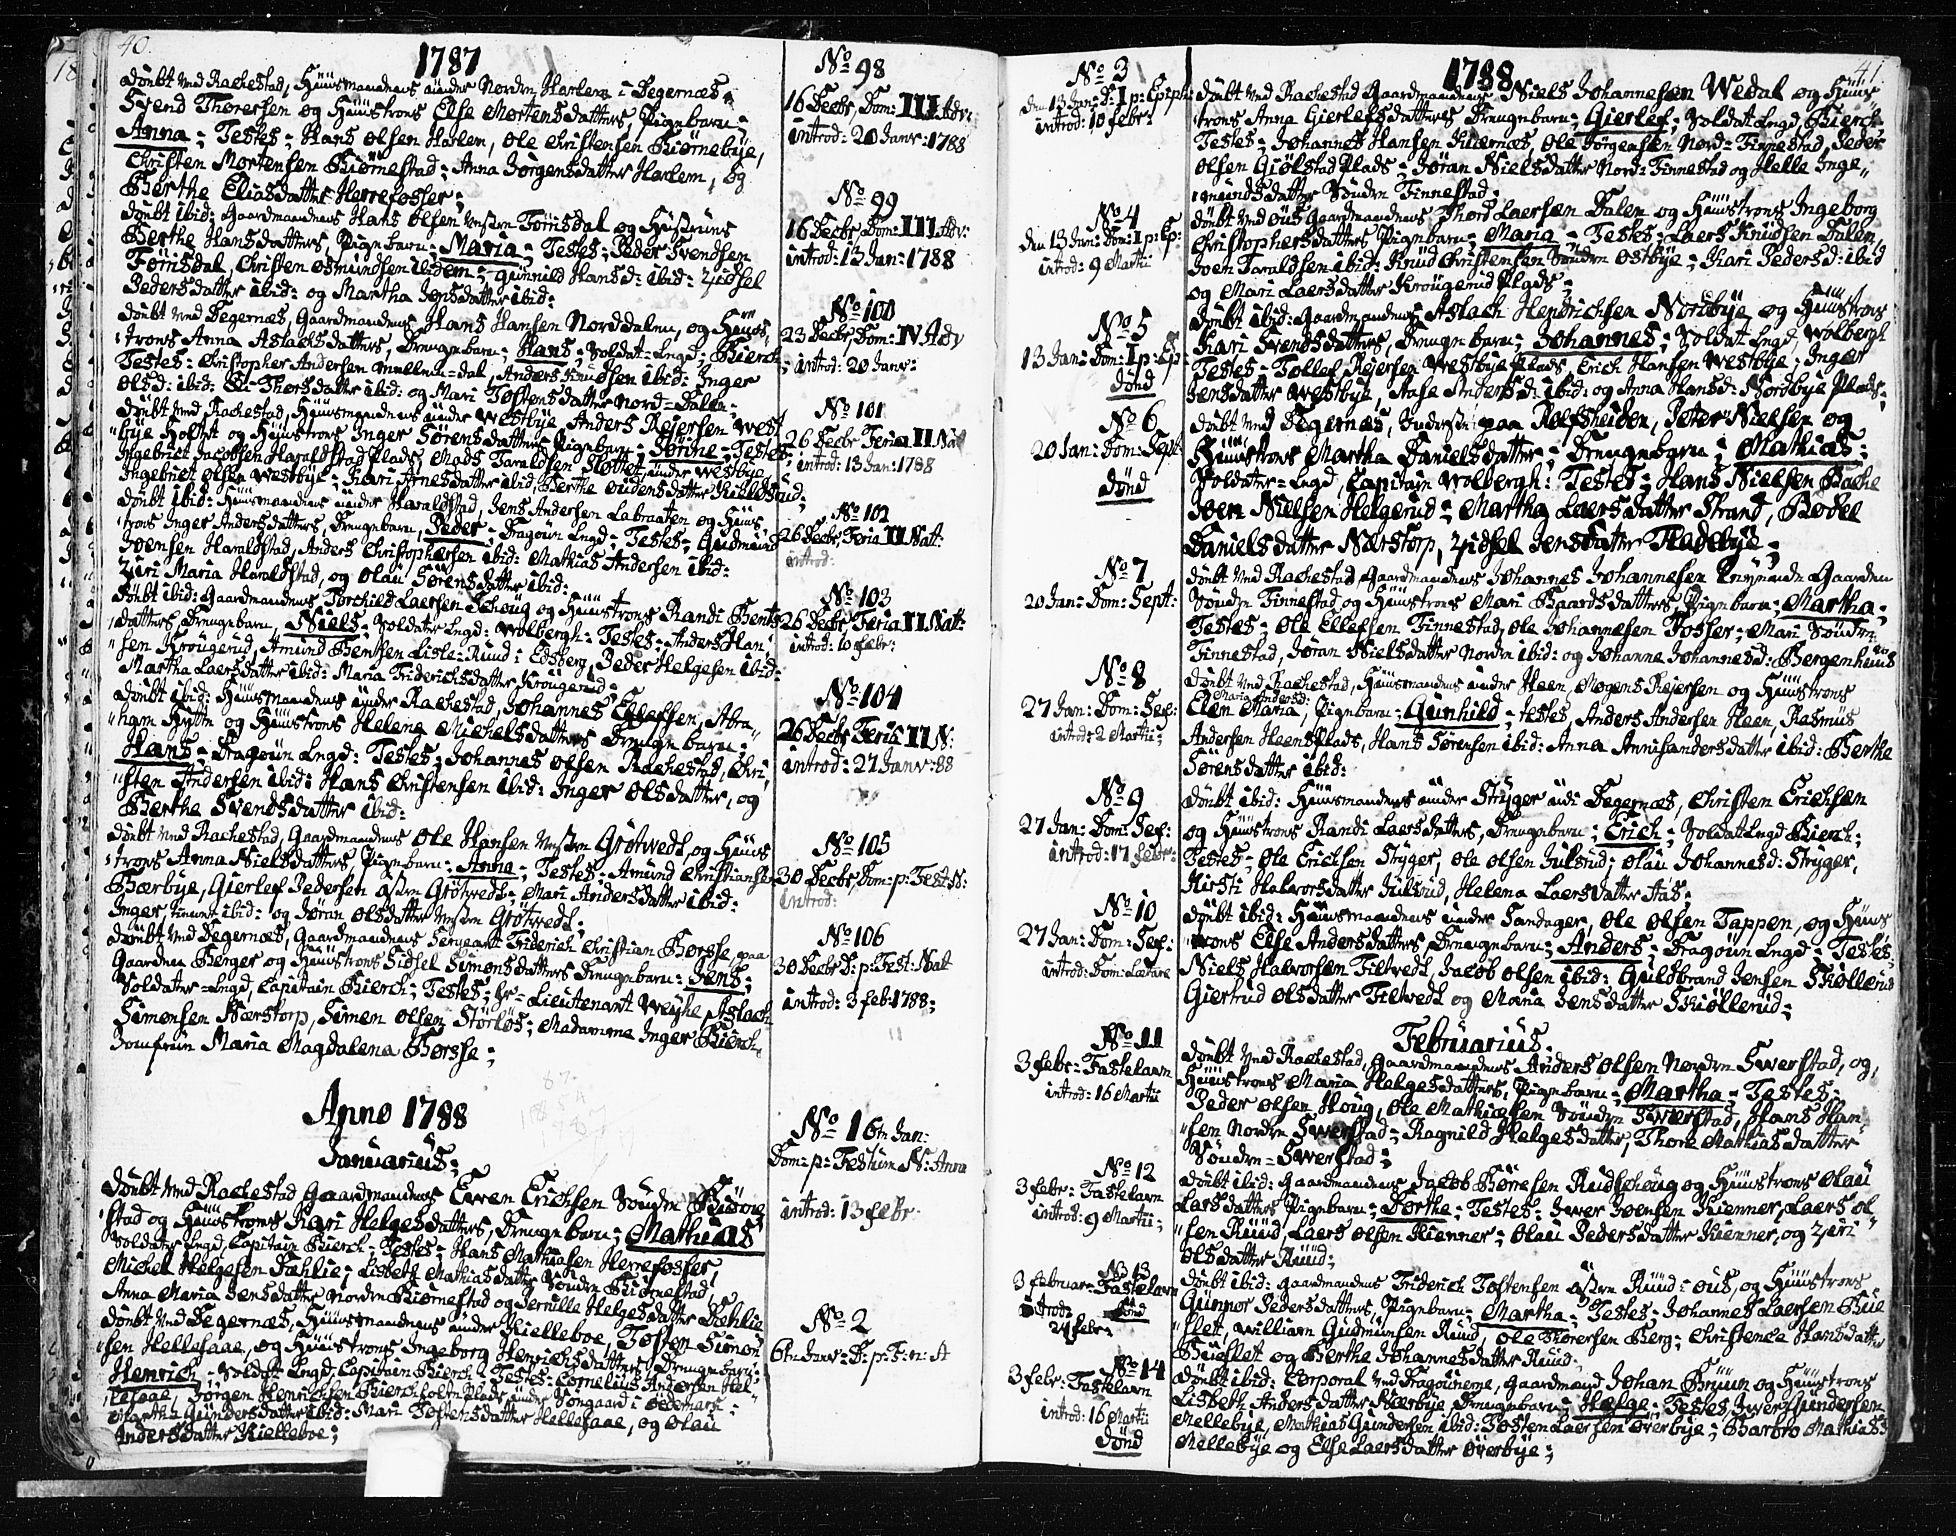 SAO, Rakkestad prestekontor Kirkebøker, F/Fa/L0005: Ministerialbok nr. I 5, 1784-1814, s. 40-41